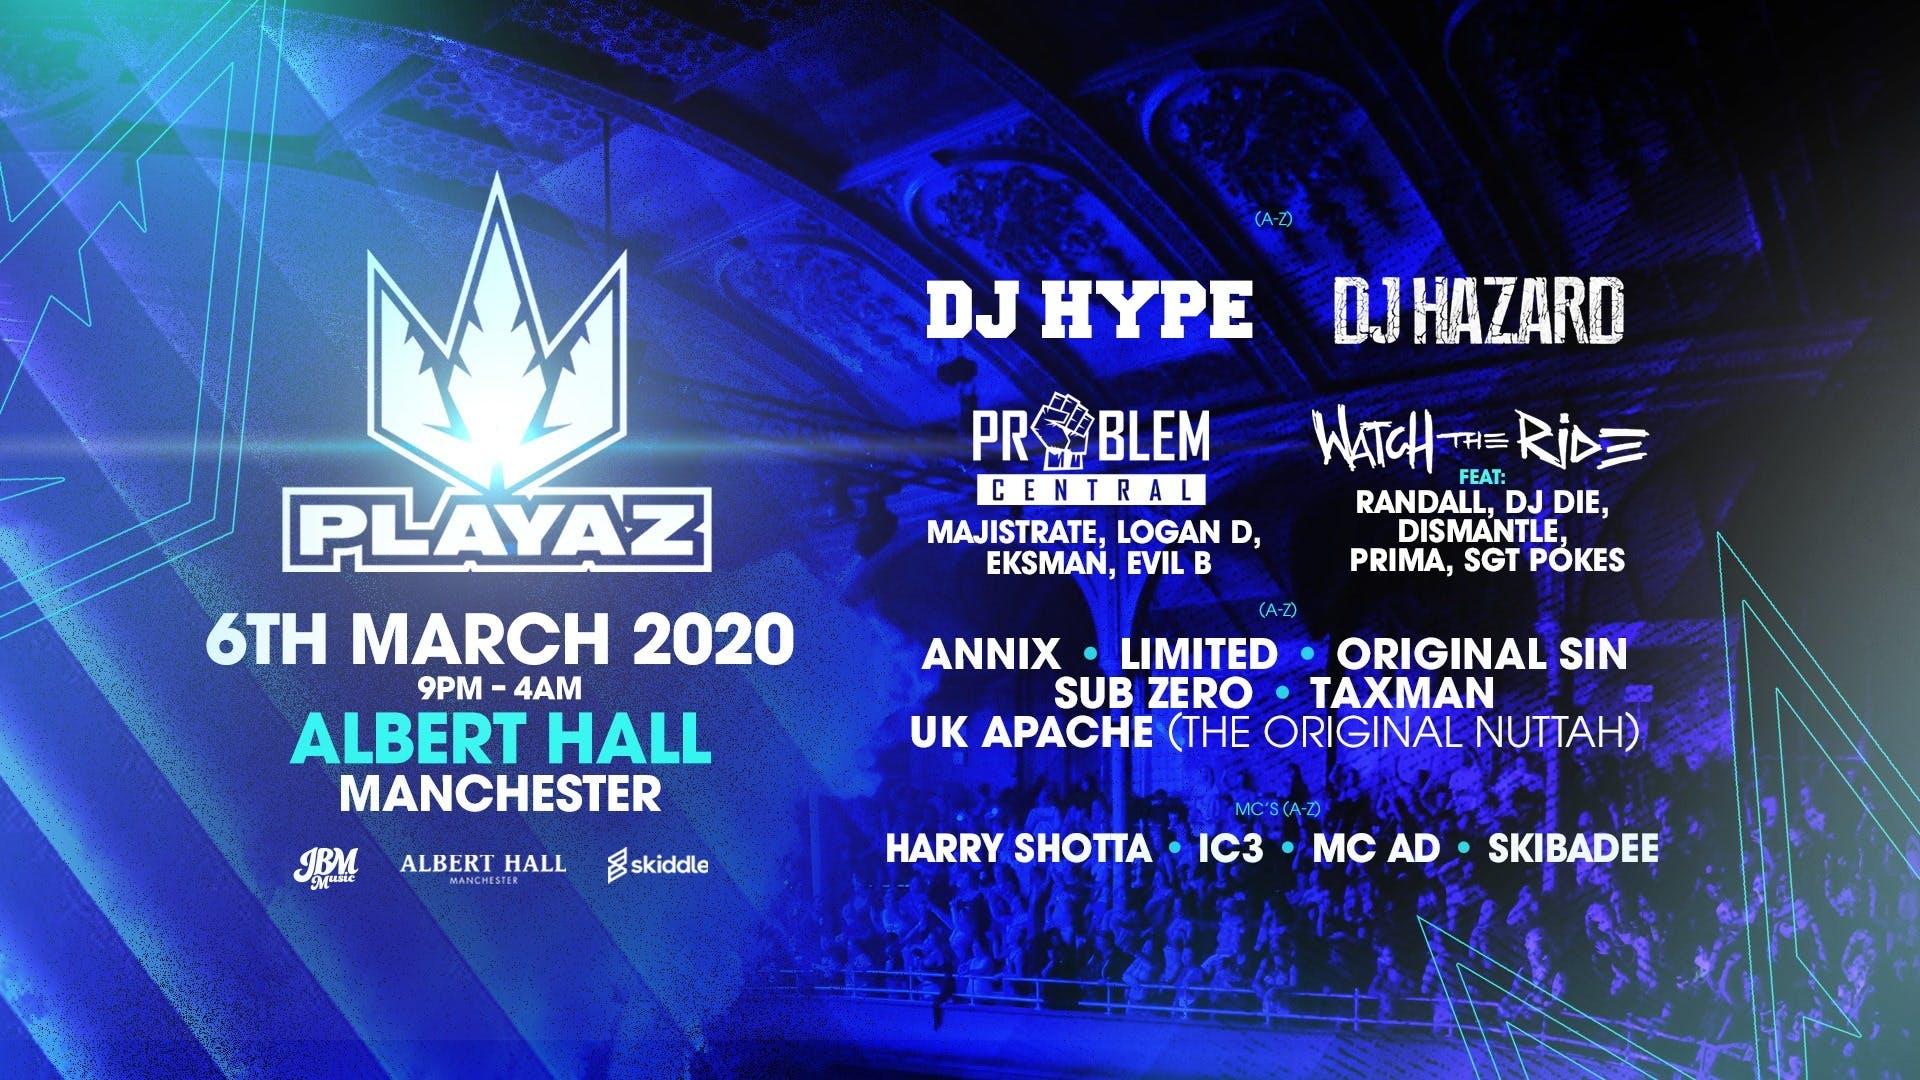 Playaz Manchester